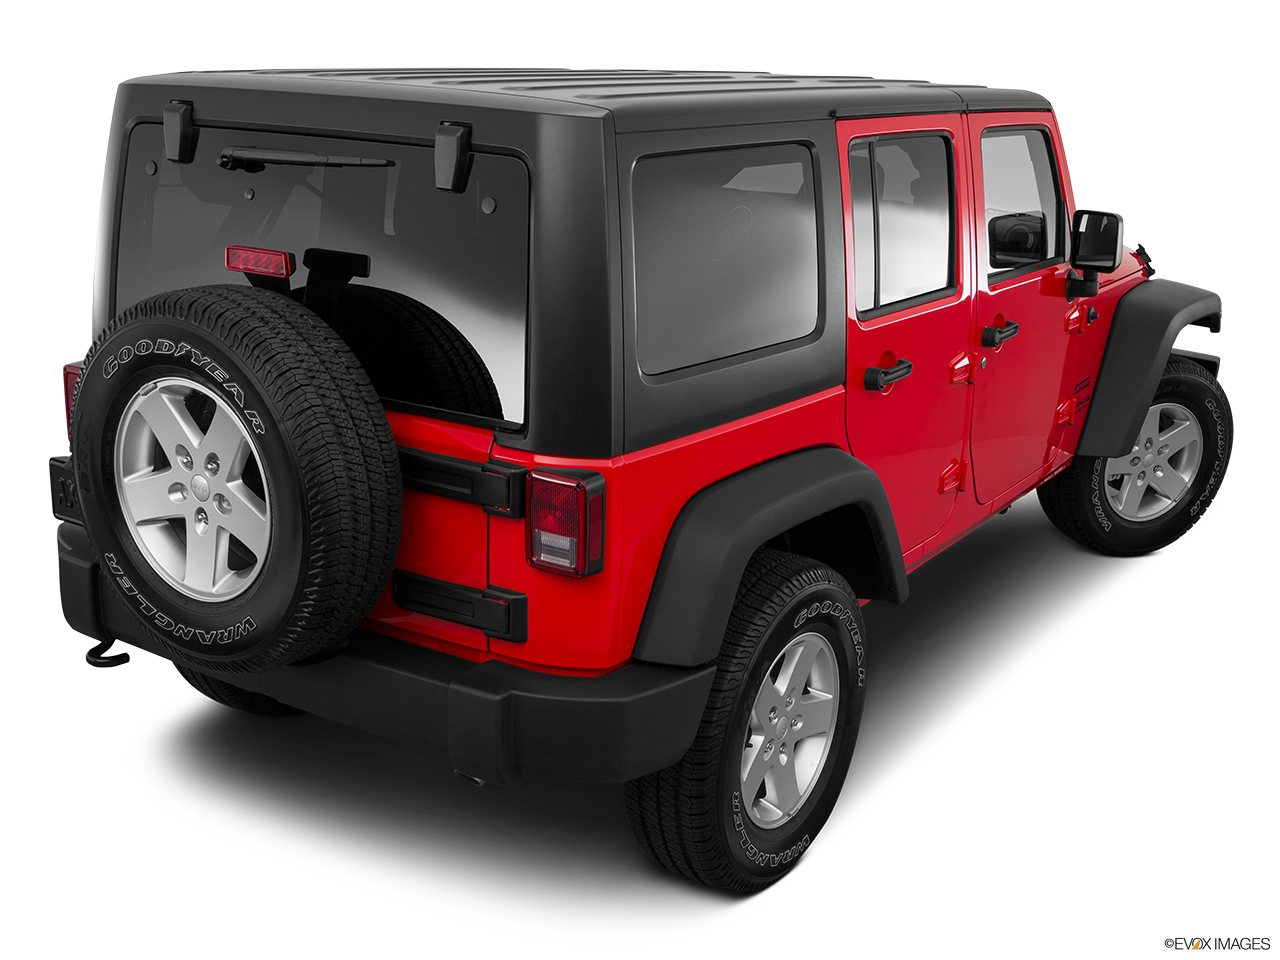 Jeep Wrangler Unlimited 2016 Sport 3.6L Manual, Bahrain, Rear 3/4 angle